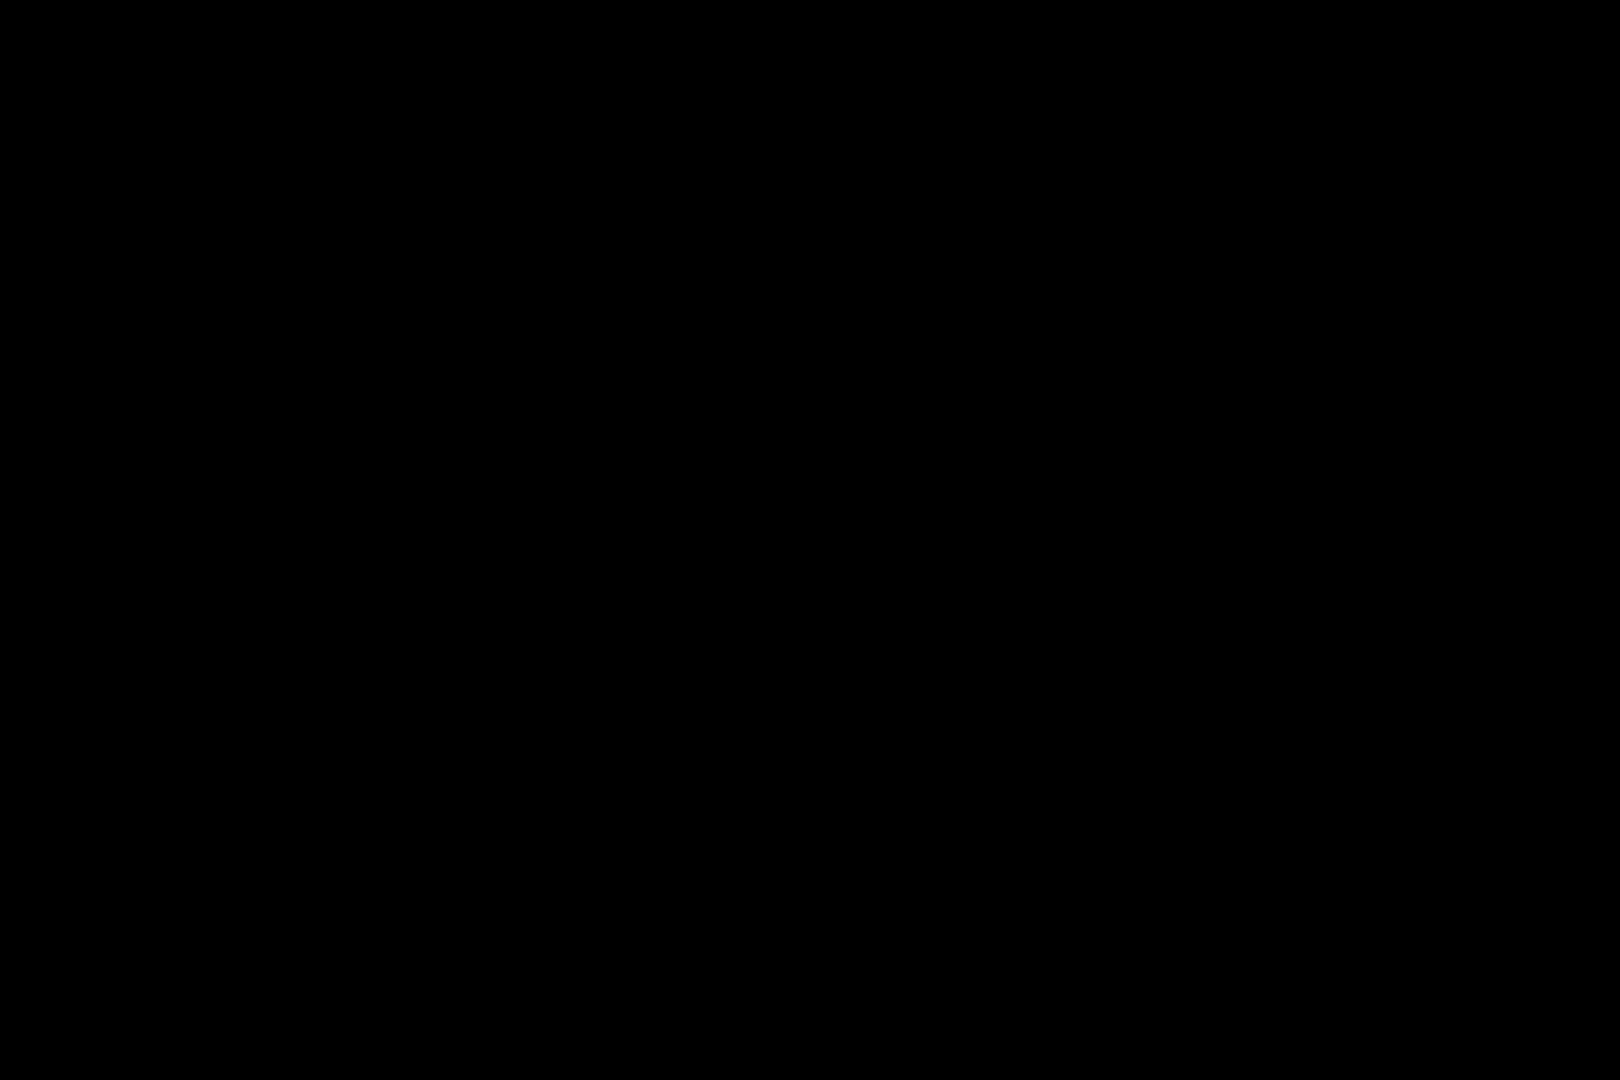 充血監督の深夜の運動会Vol.23 フェラ 盗撮動画紹介 85PIX 25